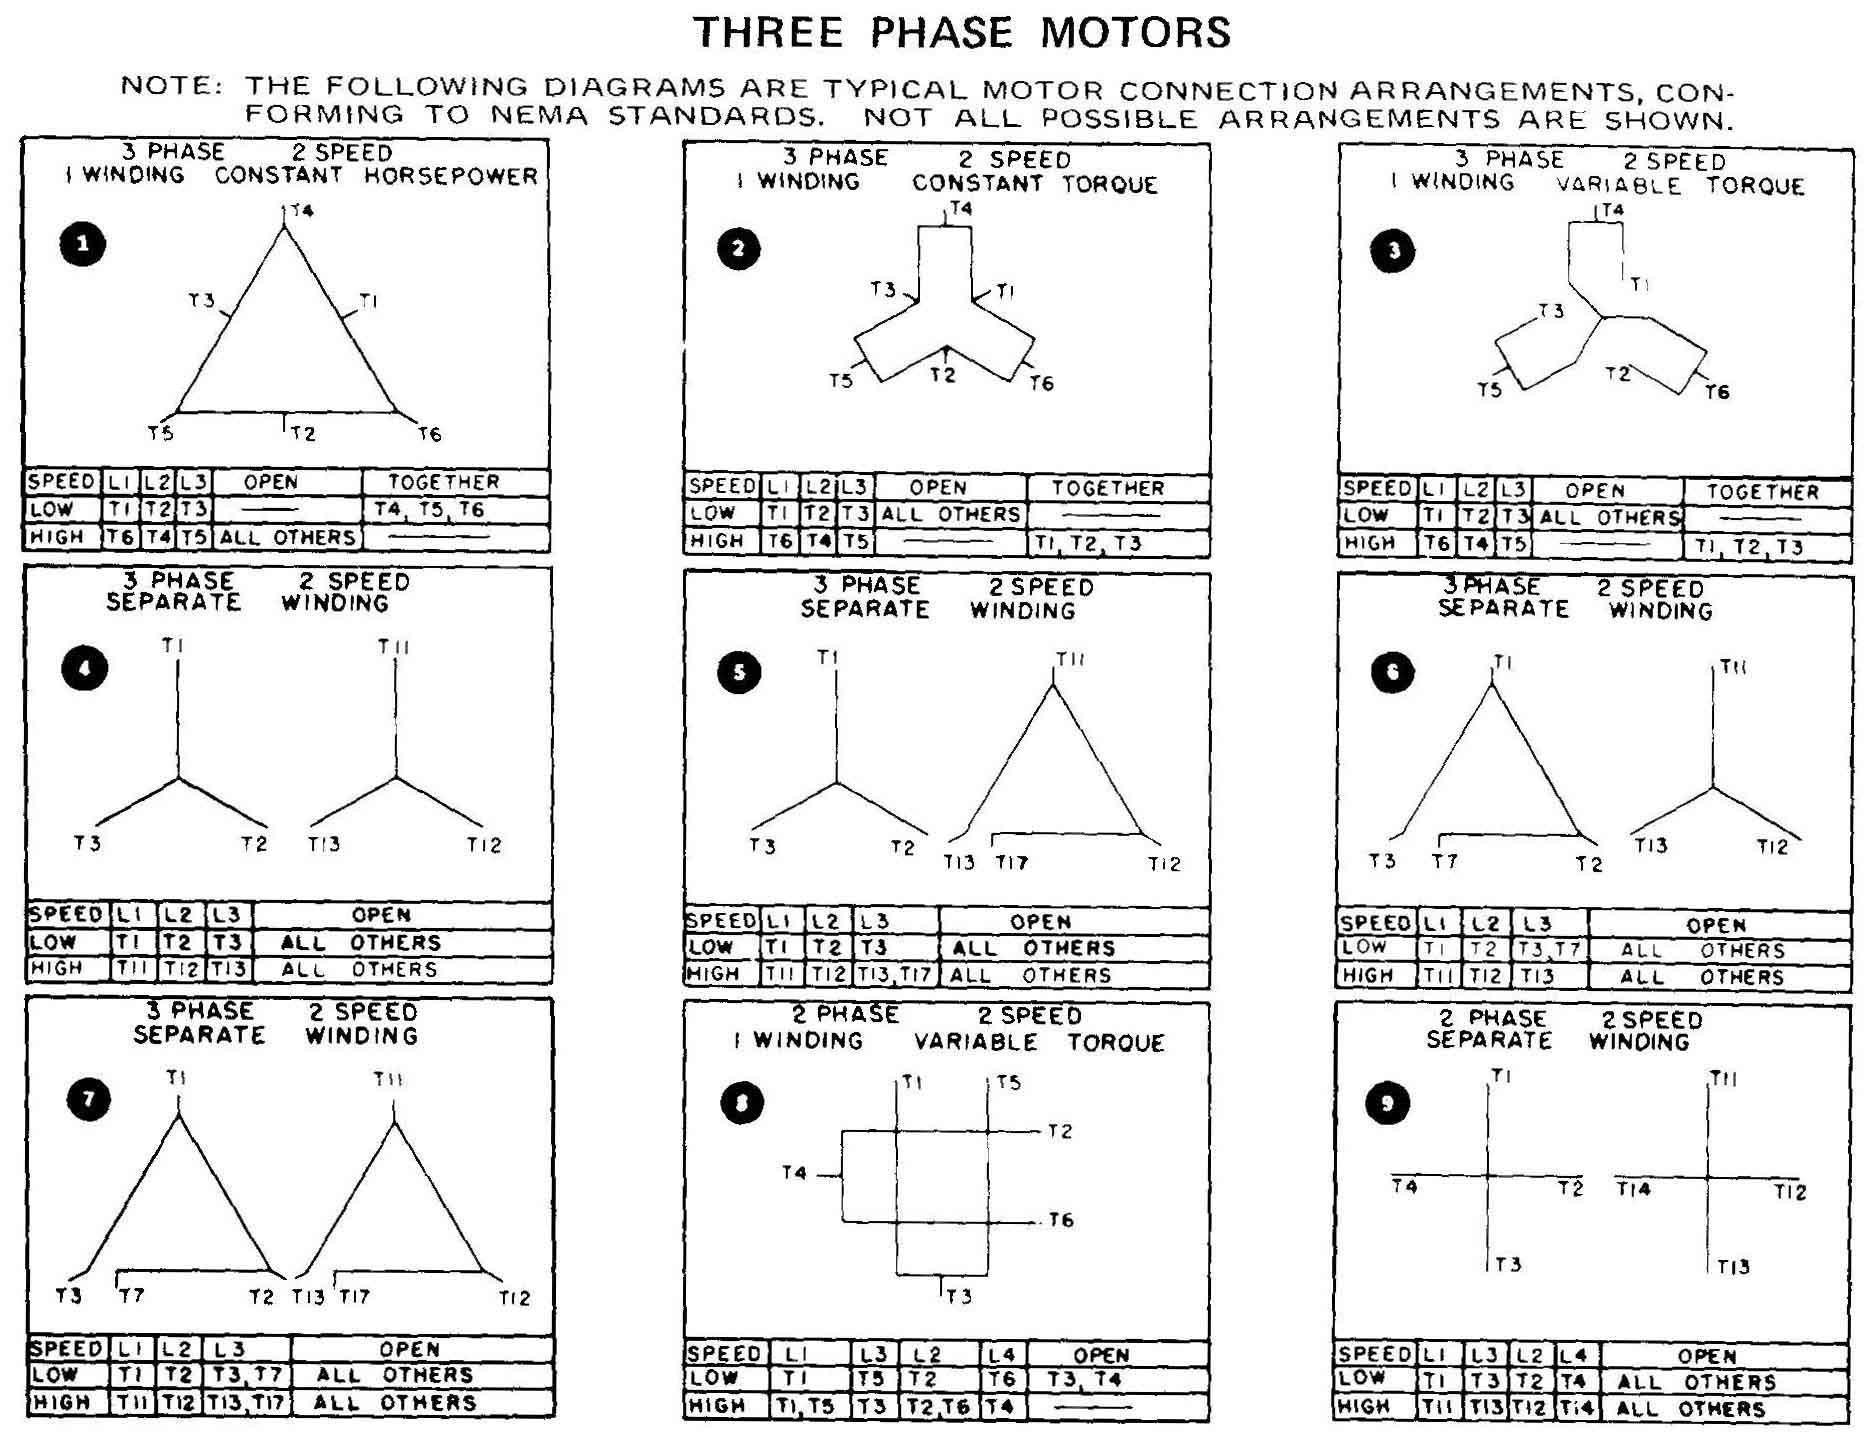 3 phase motor wiring diagram 12 leads Download-Wiring Diagram For The Motor New 6 Lead Motor Diagram Wiring Diagram Database 18-n